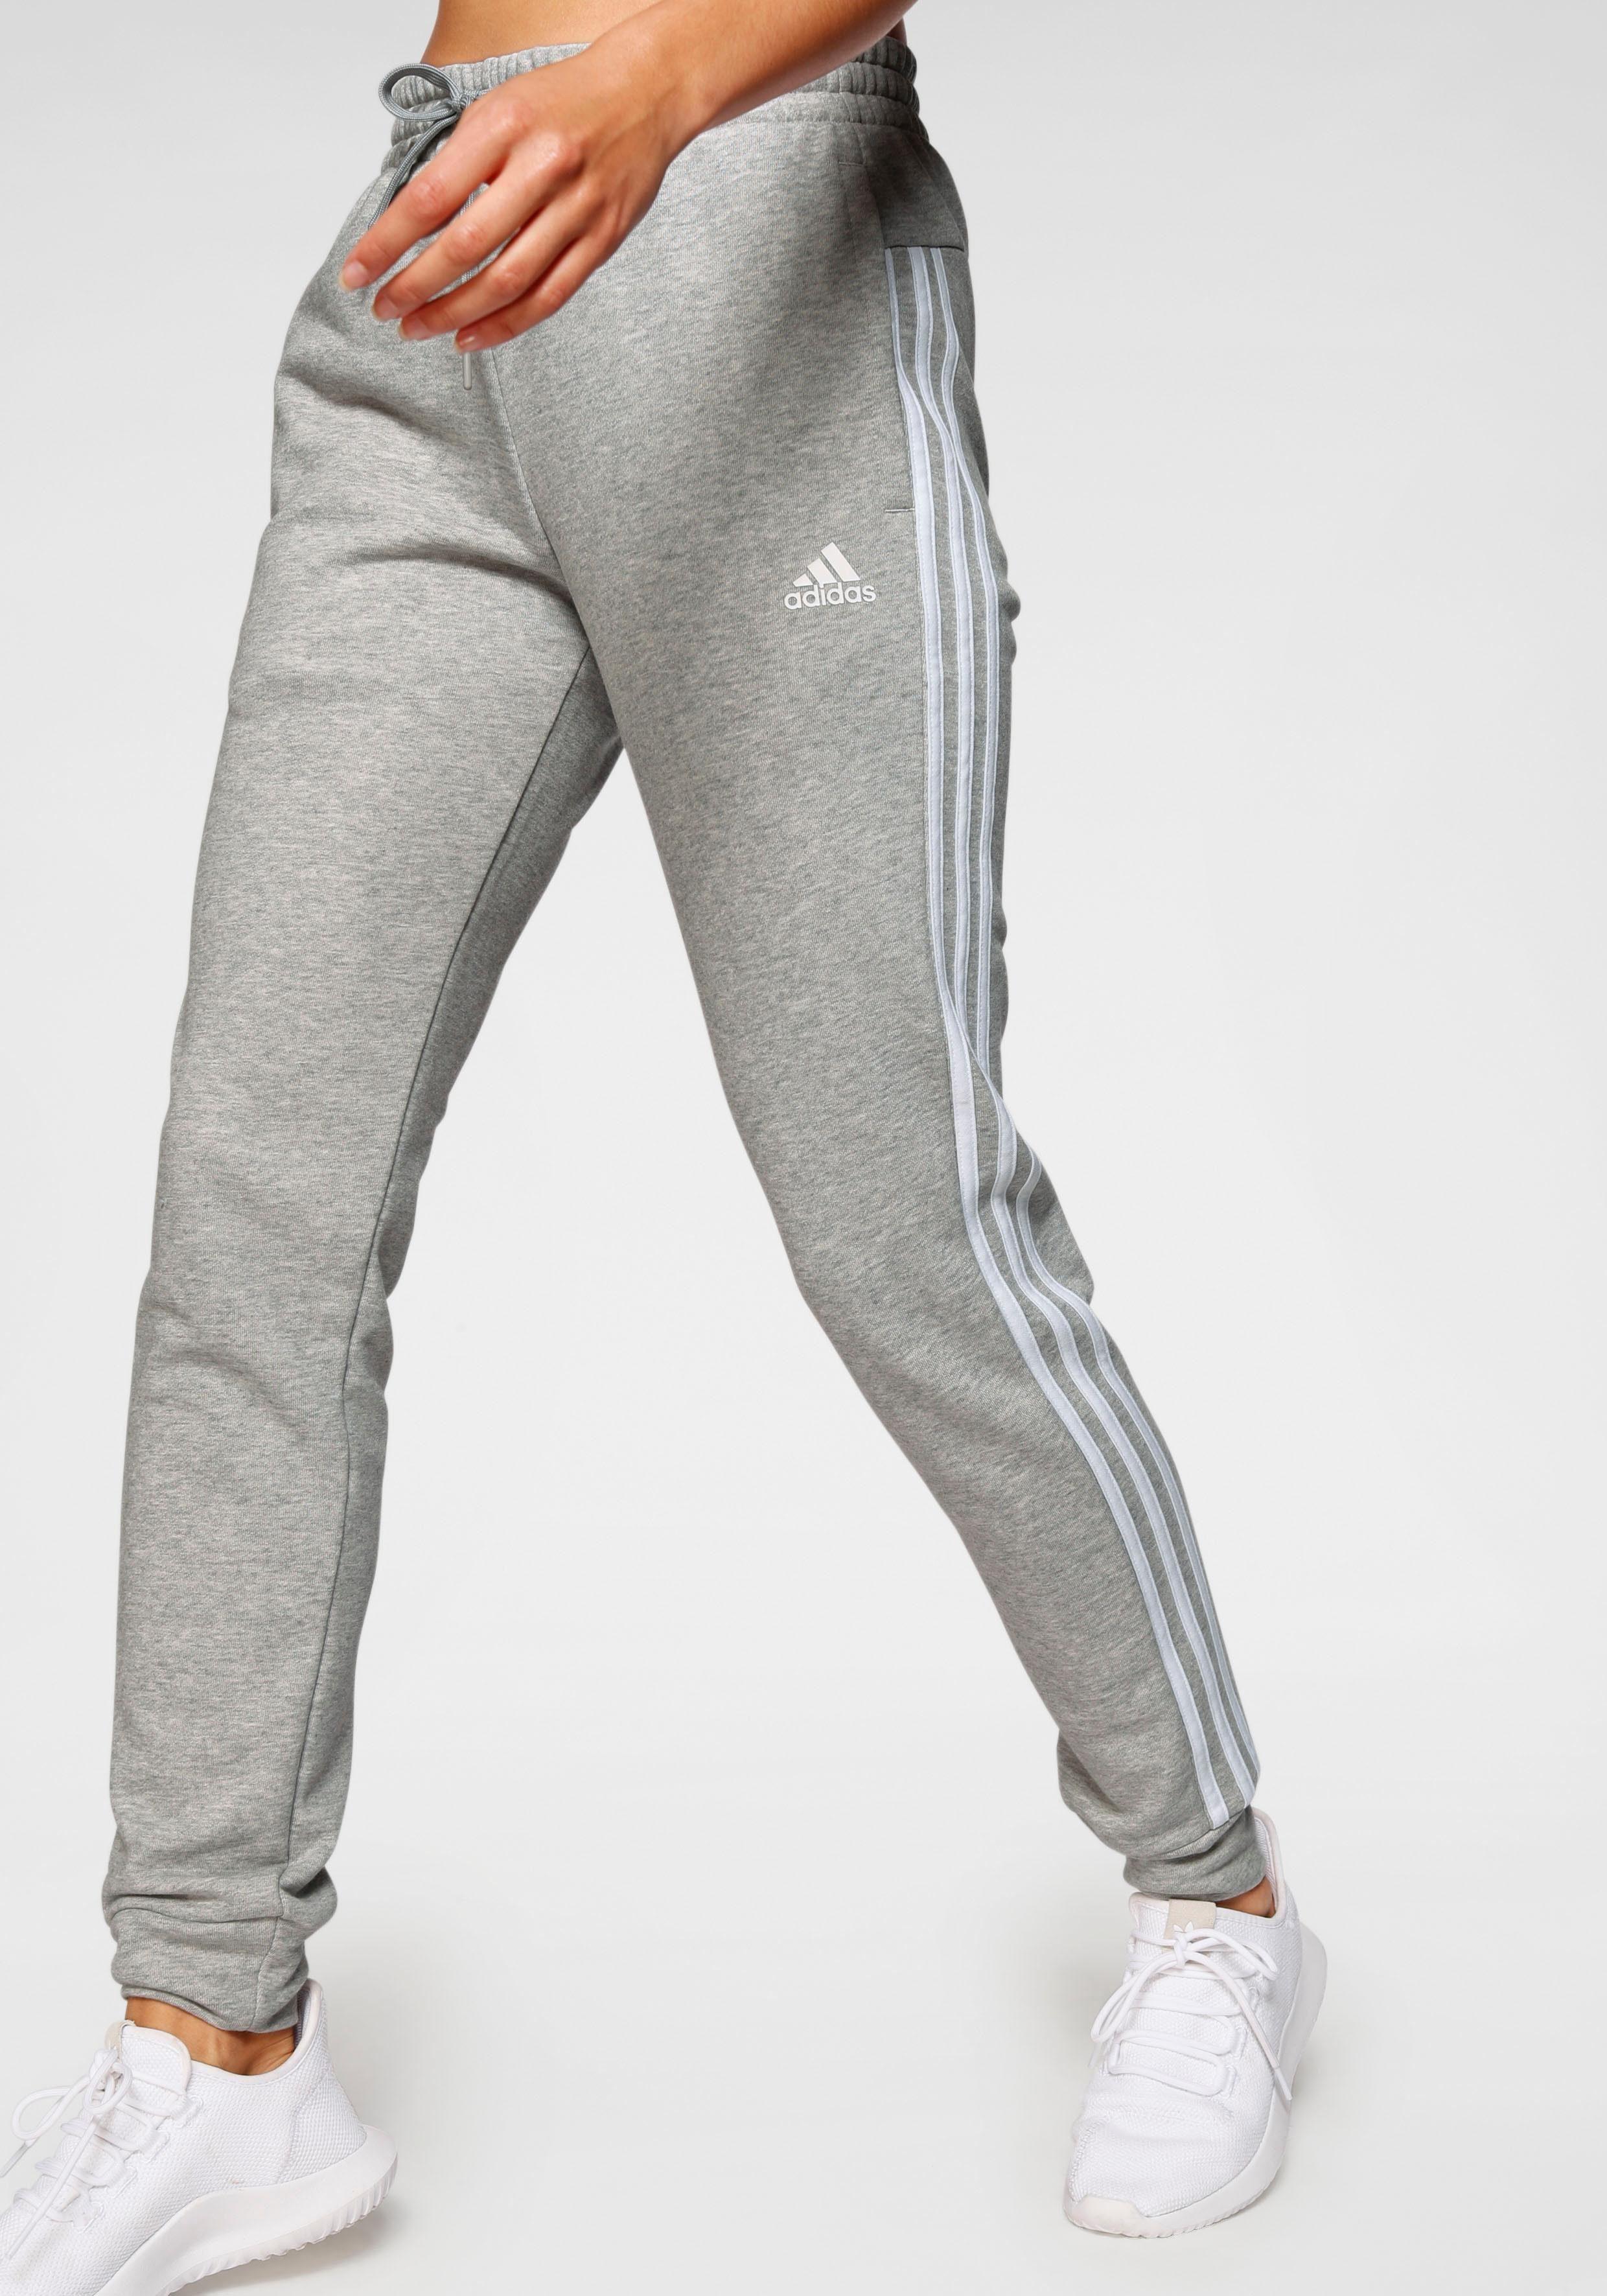 adidas Performance Jogginghose »OSR W 3 STRIPES PANT« online kaufen | OTTO